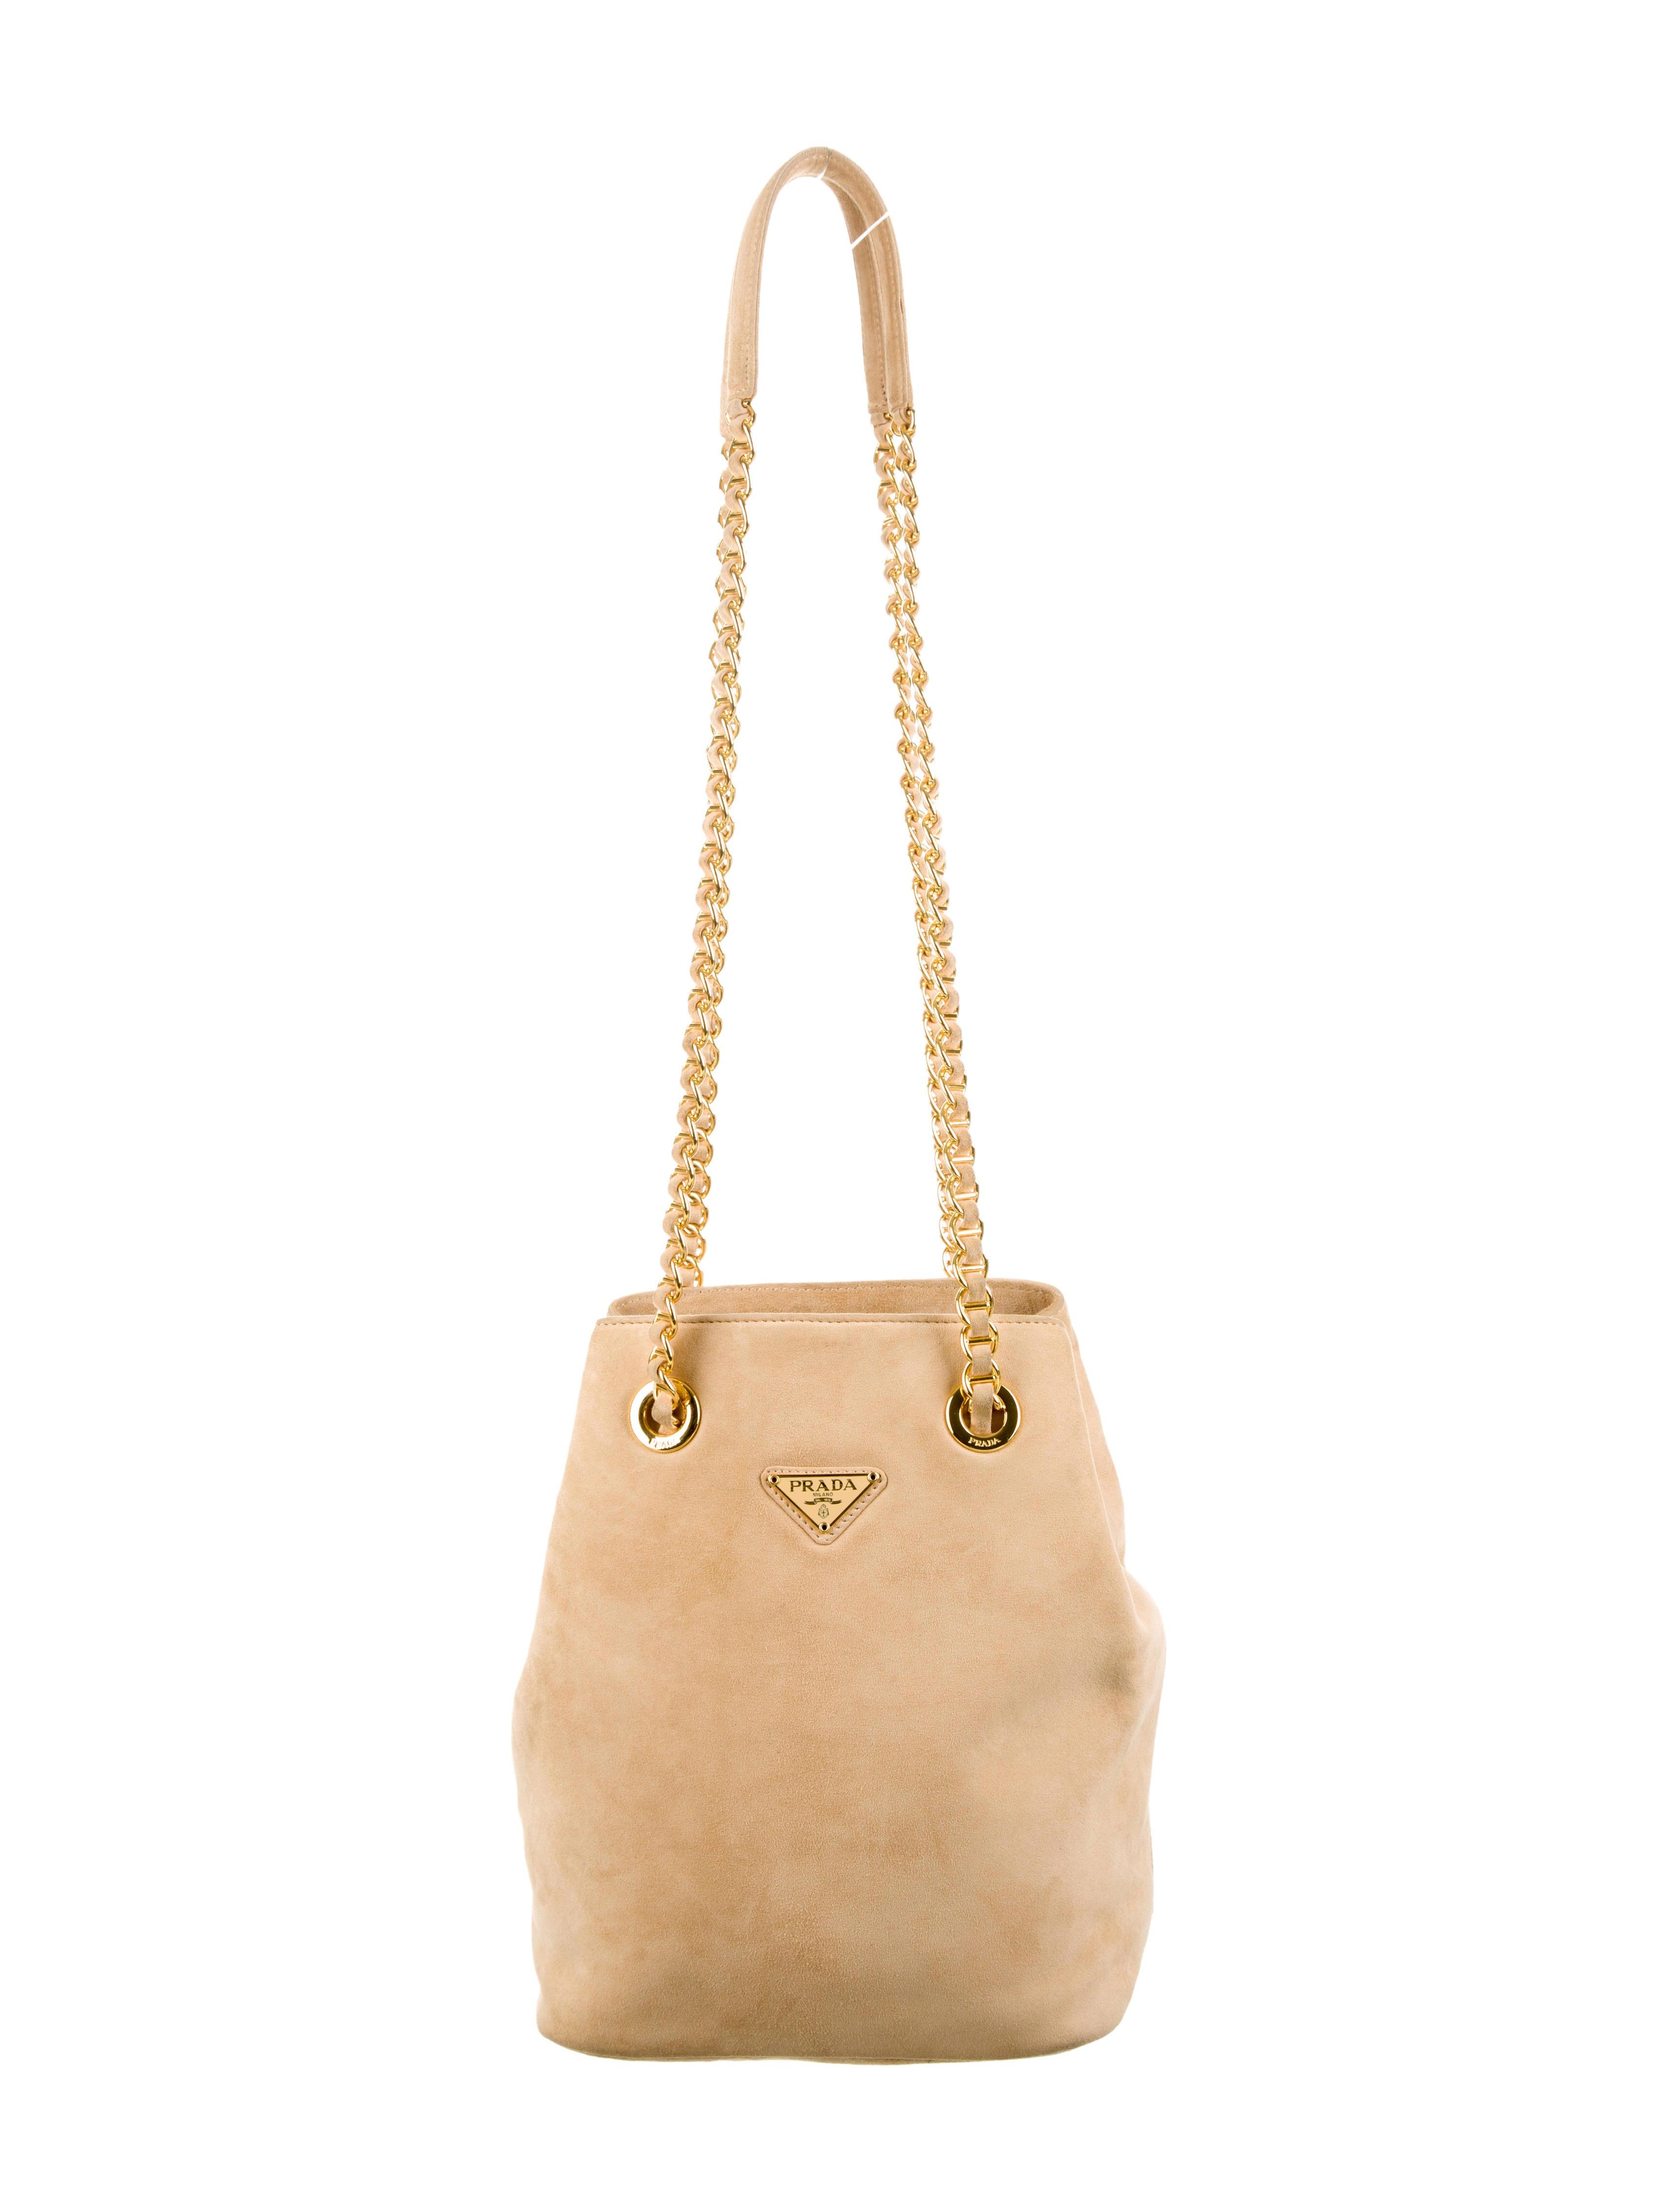 Prada Shoulder Bag - Handbags - PRA69379   The RealReal